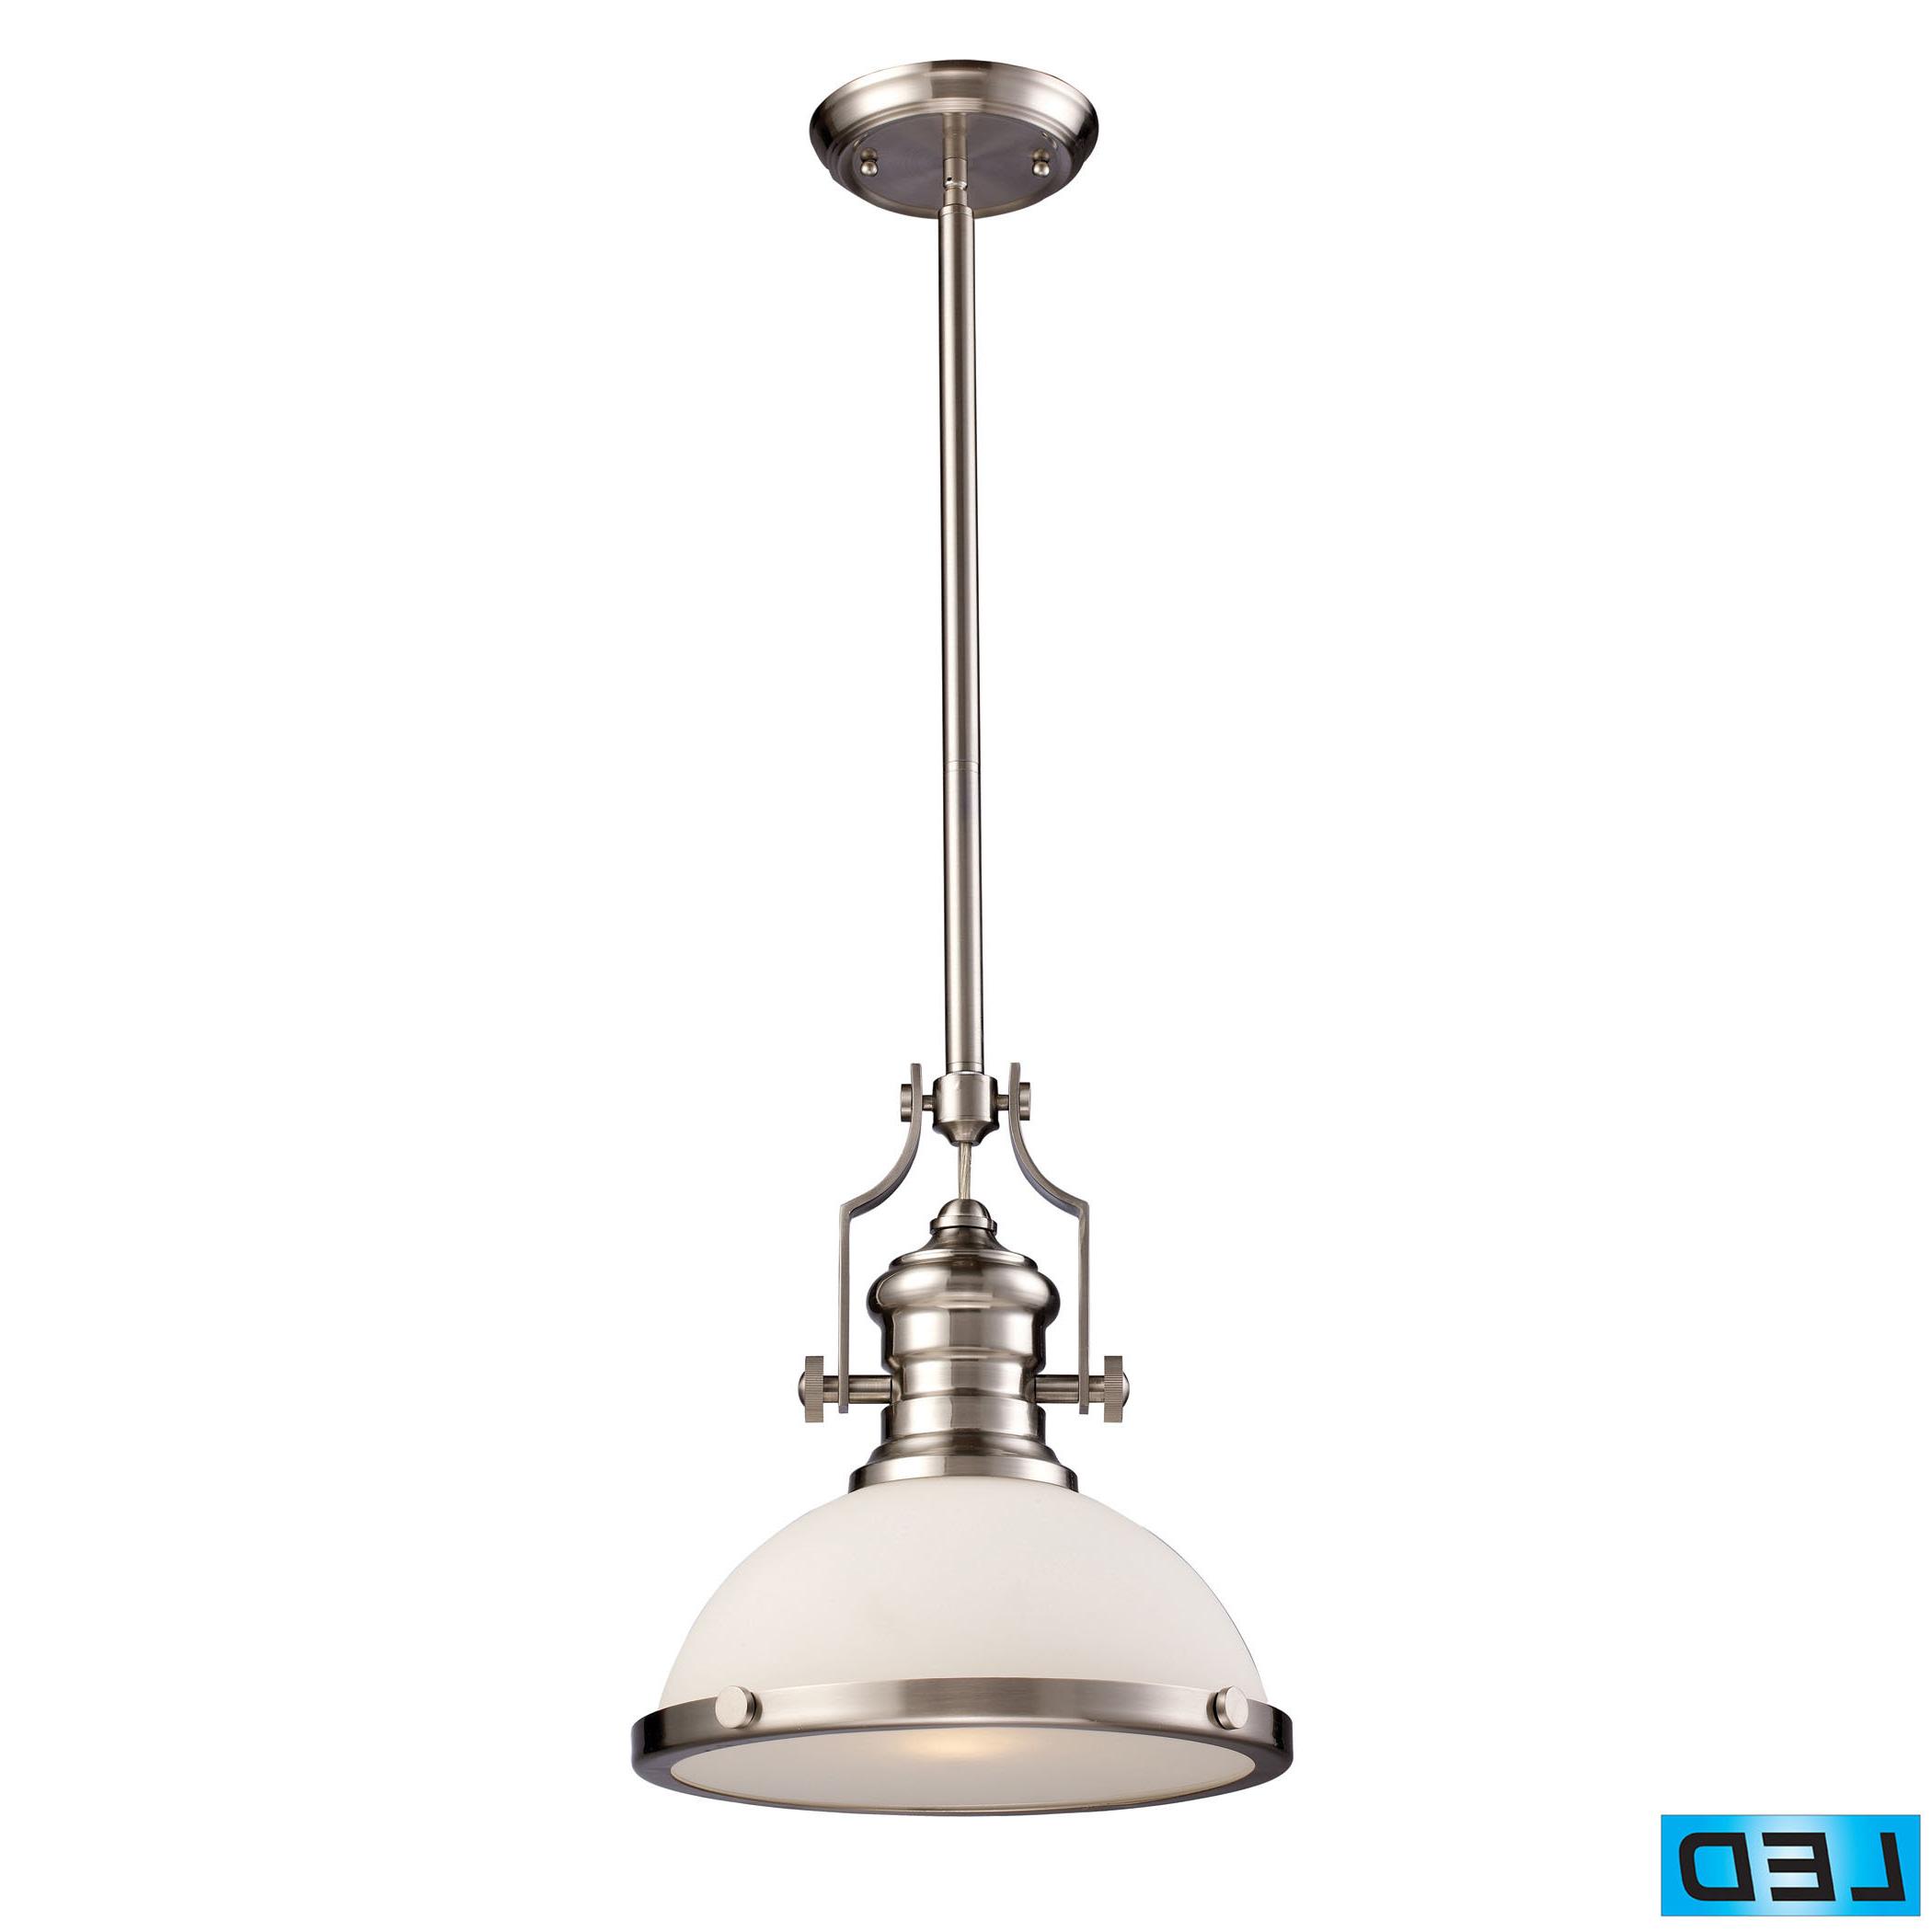 Priston 1 Light Single Dome Pendant With Regard To 2019 Erico 1 Light Single Bell Pendants (View 16 of 25)